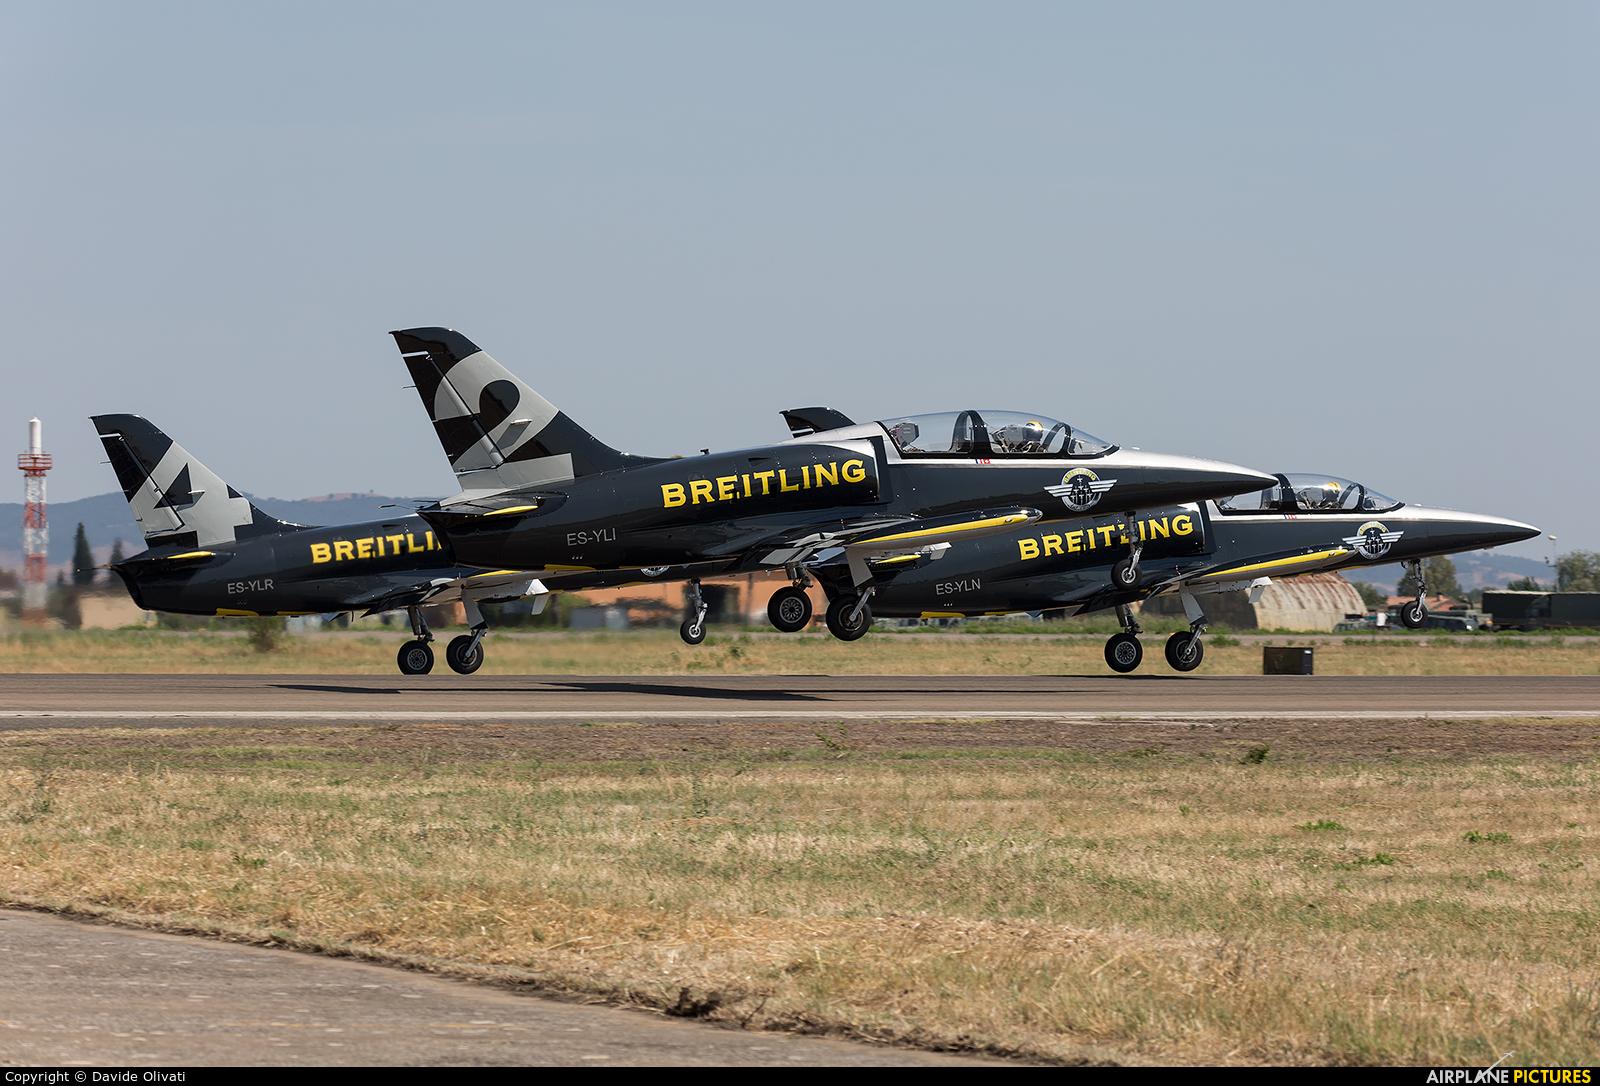 Breitling Jet Team ES-YLI aircraft at Grosseto - Corrado Baccarini